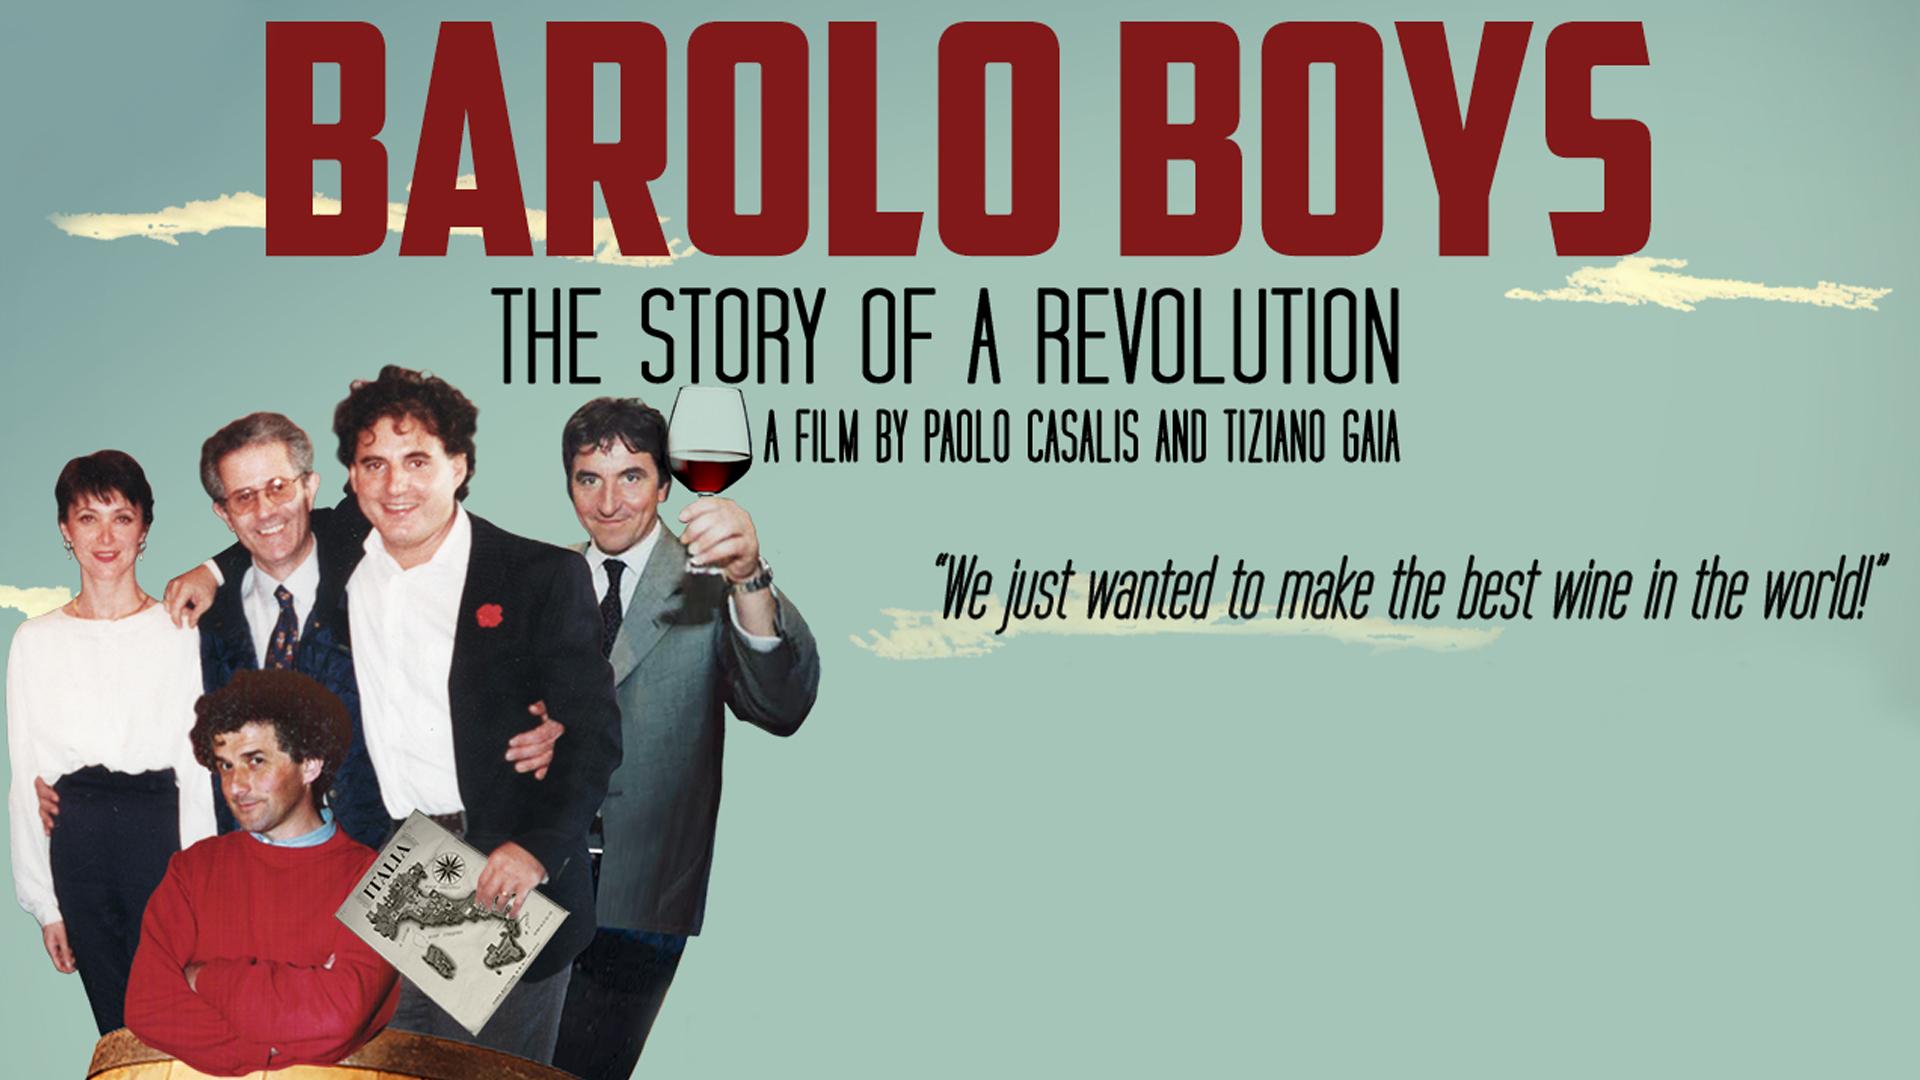 Barolo Boys. The Story of a Revolution